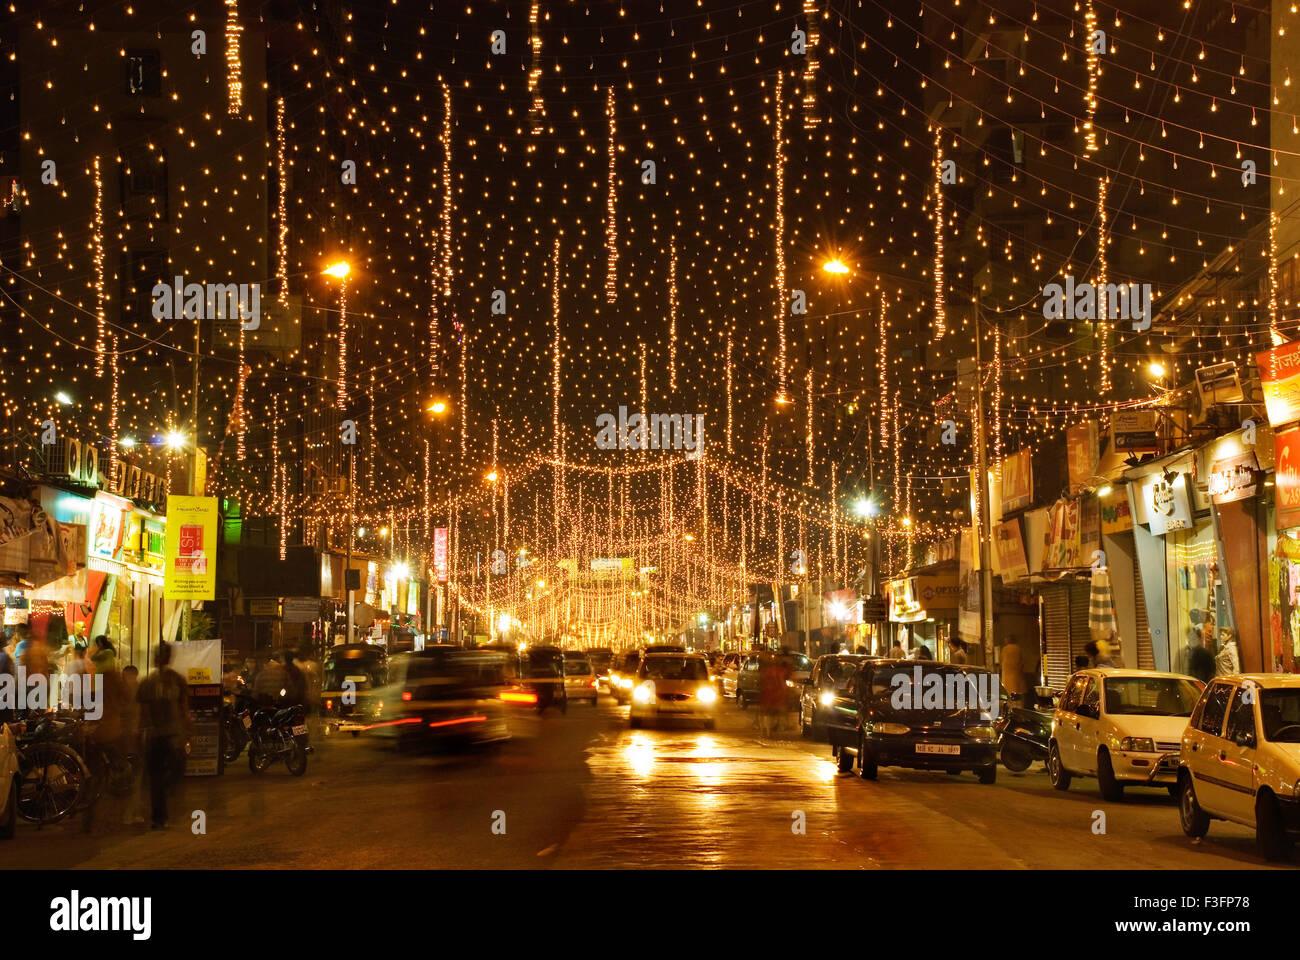 Hd Wallpaper Diwali Light Diwali Festivities A Street In Lokhandwala Andheri